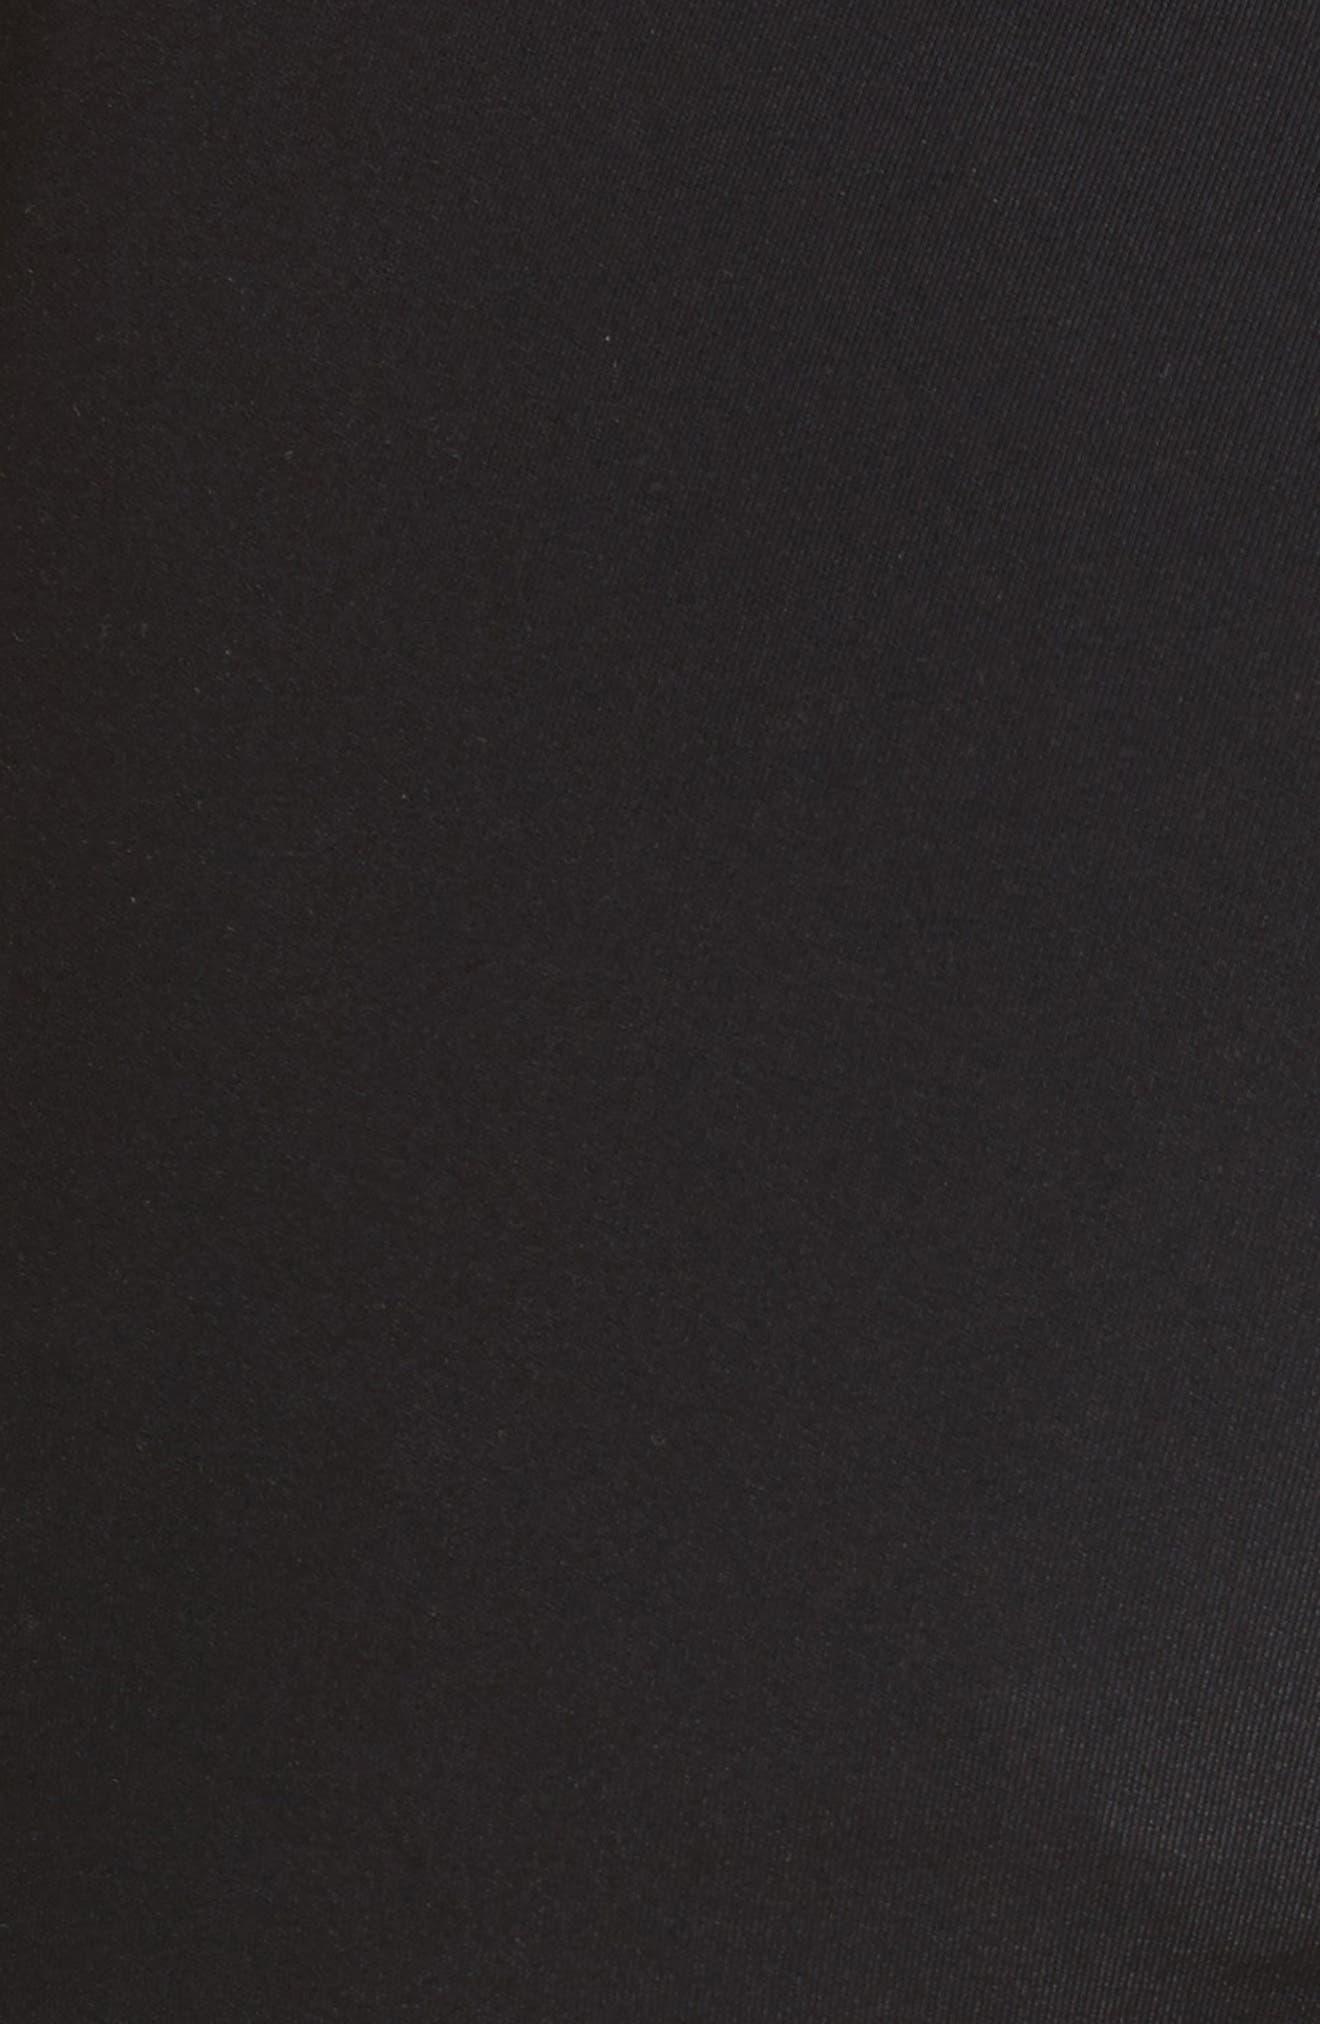 Technical Crop Flare Leggings,                             Alternate thumbnail 5, color,                             Black